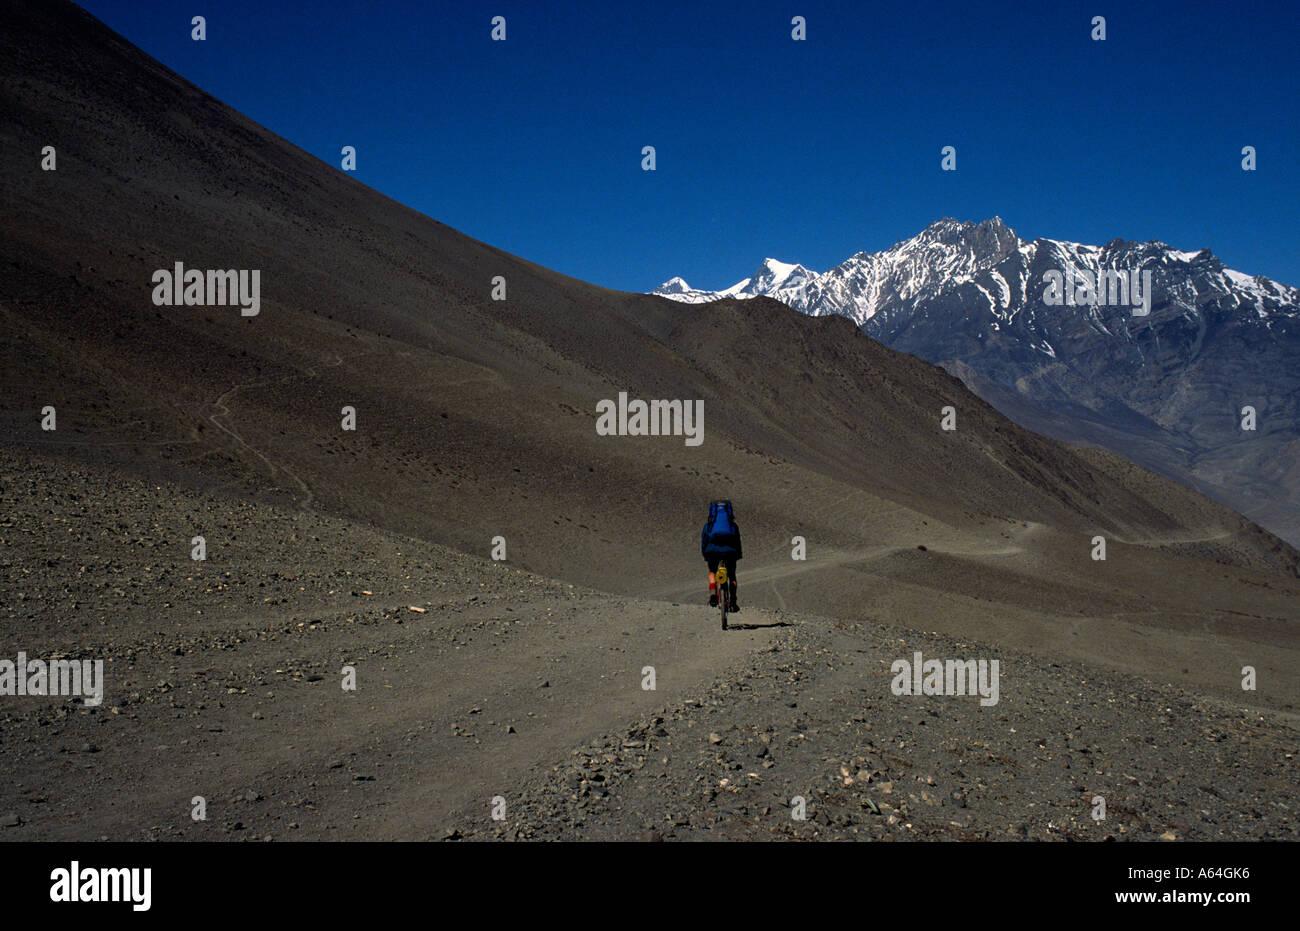 PICTURE CREDIT DOUG BLANE Doug Blane mountain biking around the Annapurna Circuit in the Himalayan Kingdom of Nepal - Stock Image